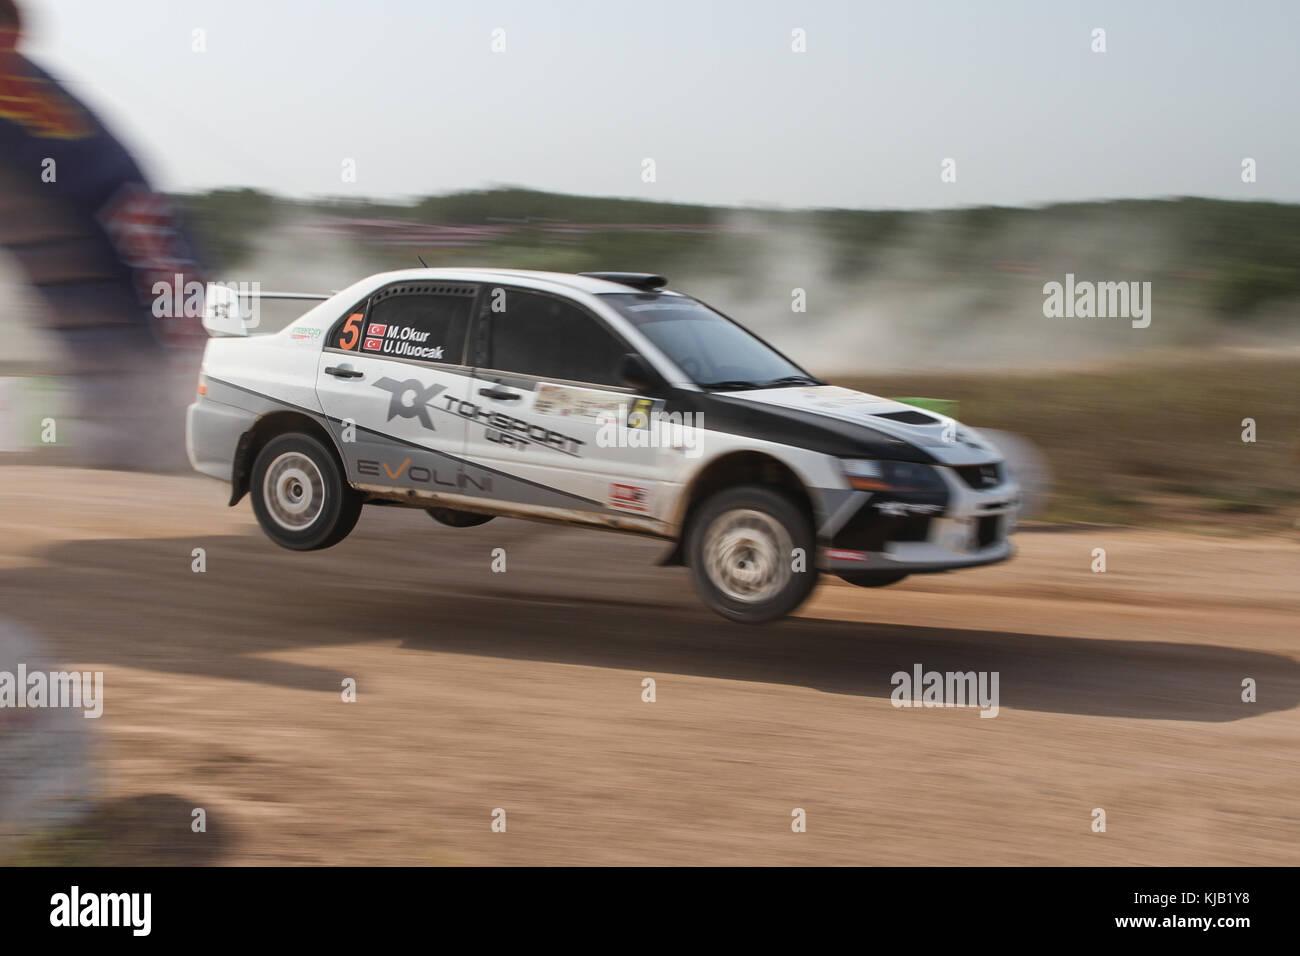 Istanbul, Türkei - 10. September 2017: menderes okur Antriebe Mitsubishi Lancer Evo IX Der toksport wrt Team Stockbild